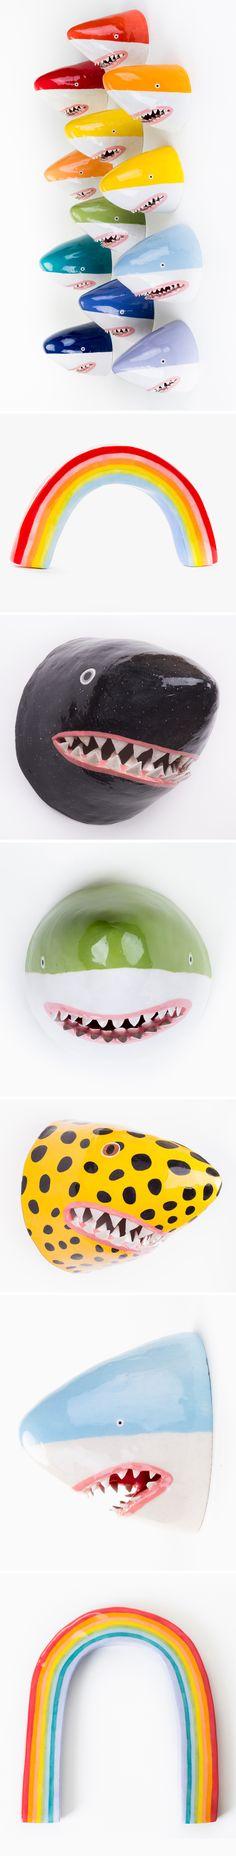 ceramic sharks 'n rainbows by lorien stern <3